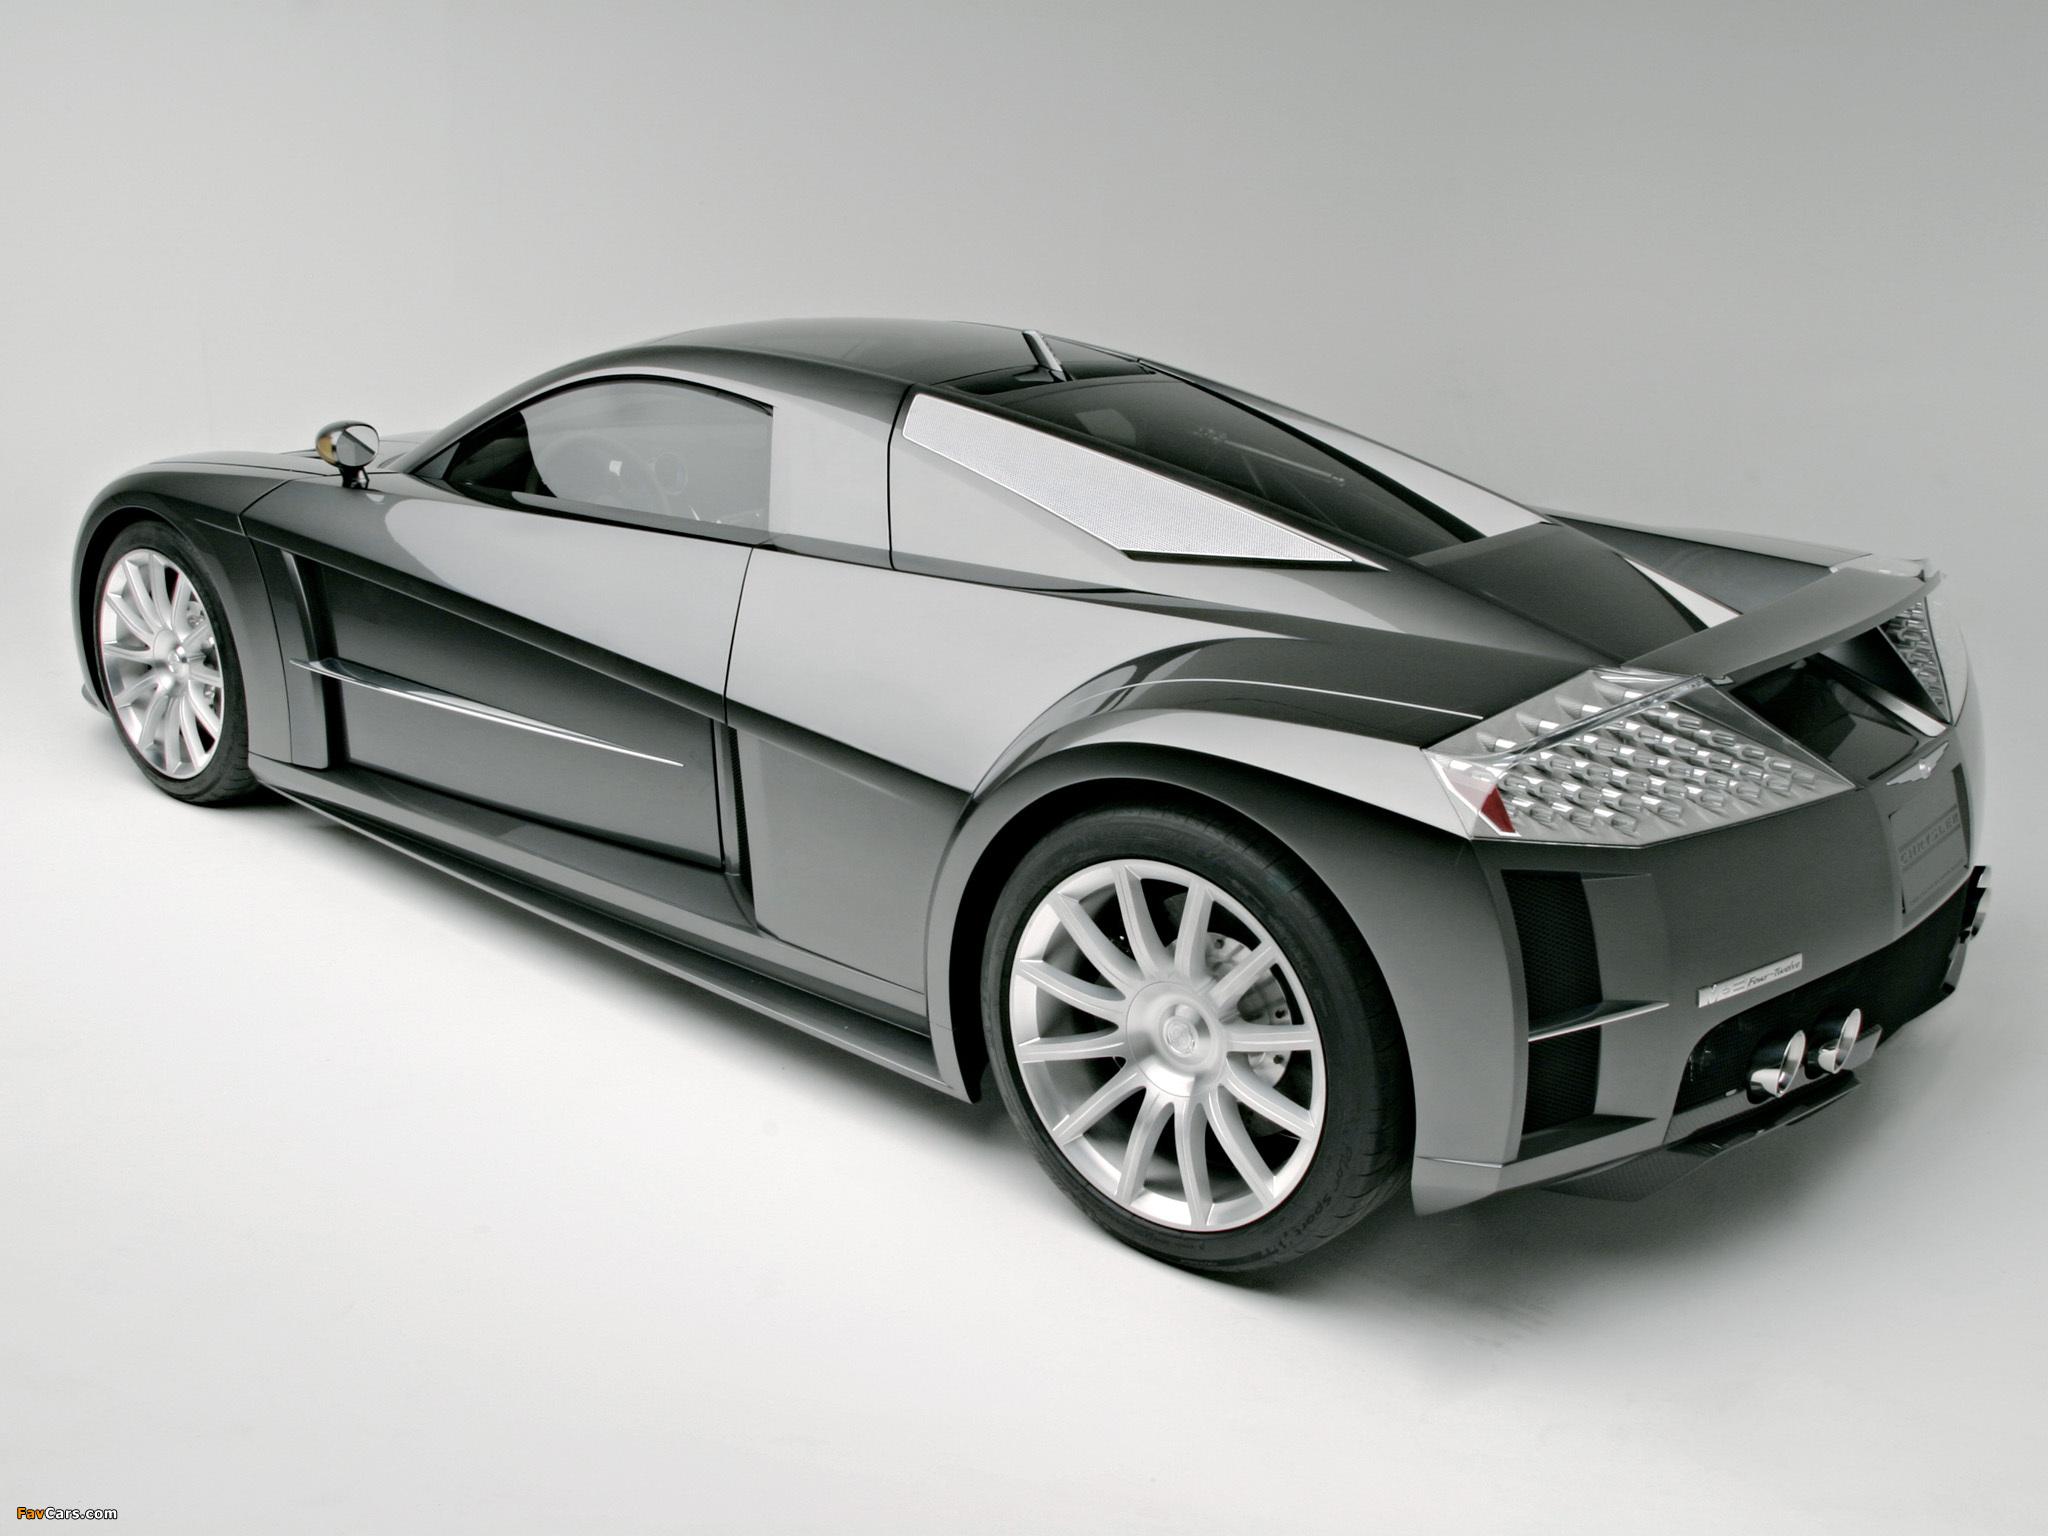 Chrysler ME 4-12 Concept 2004 images (2048 x 1536)